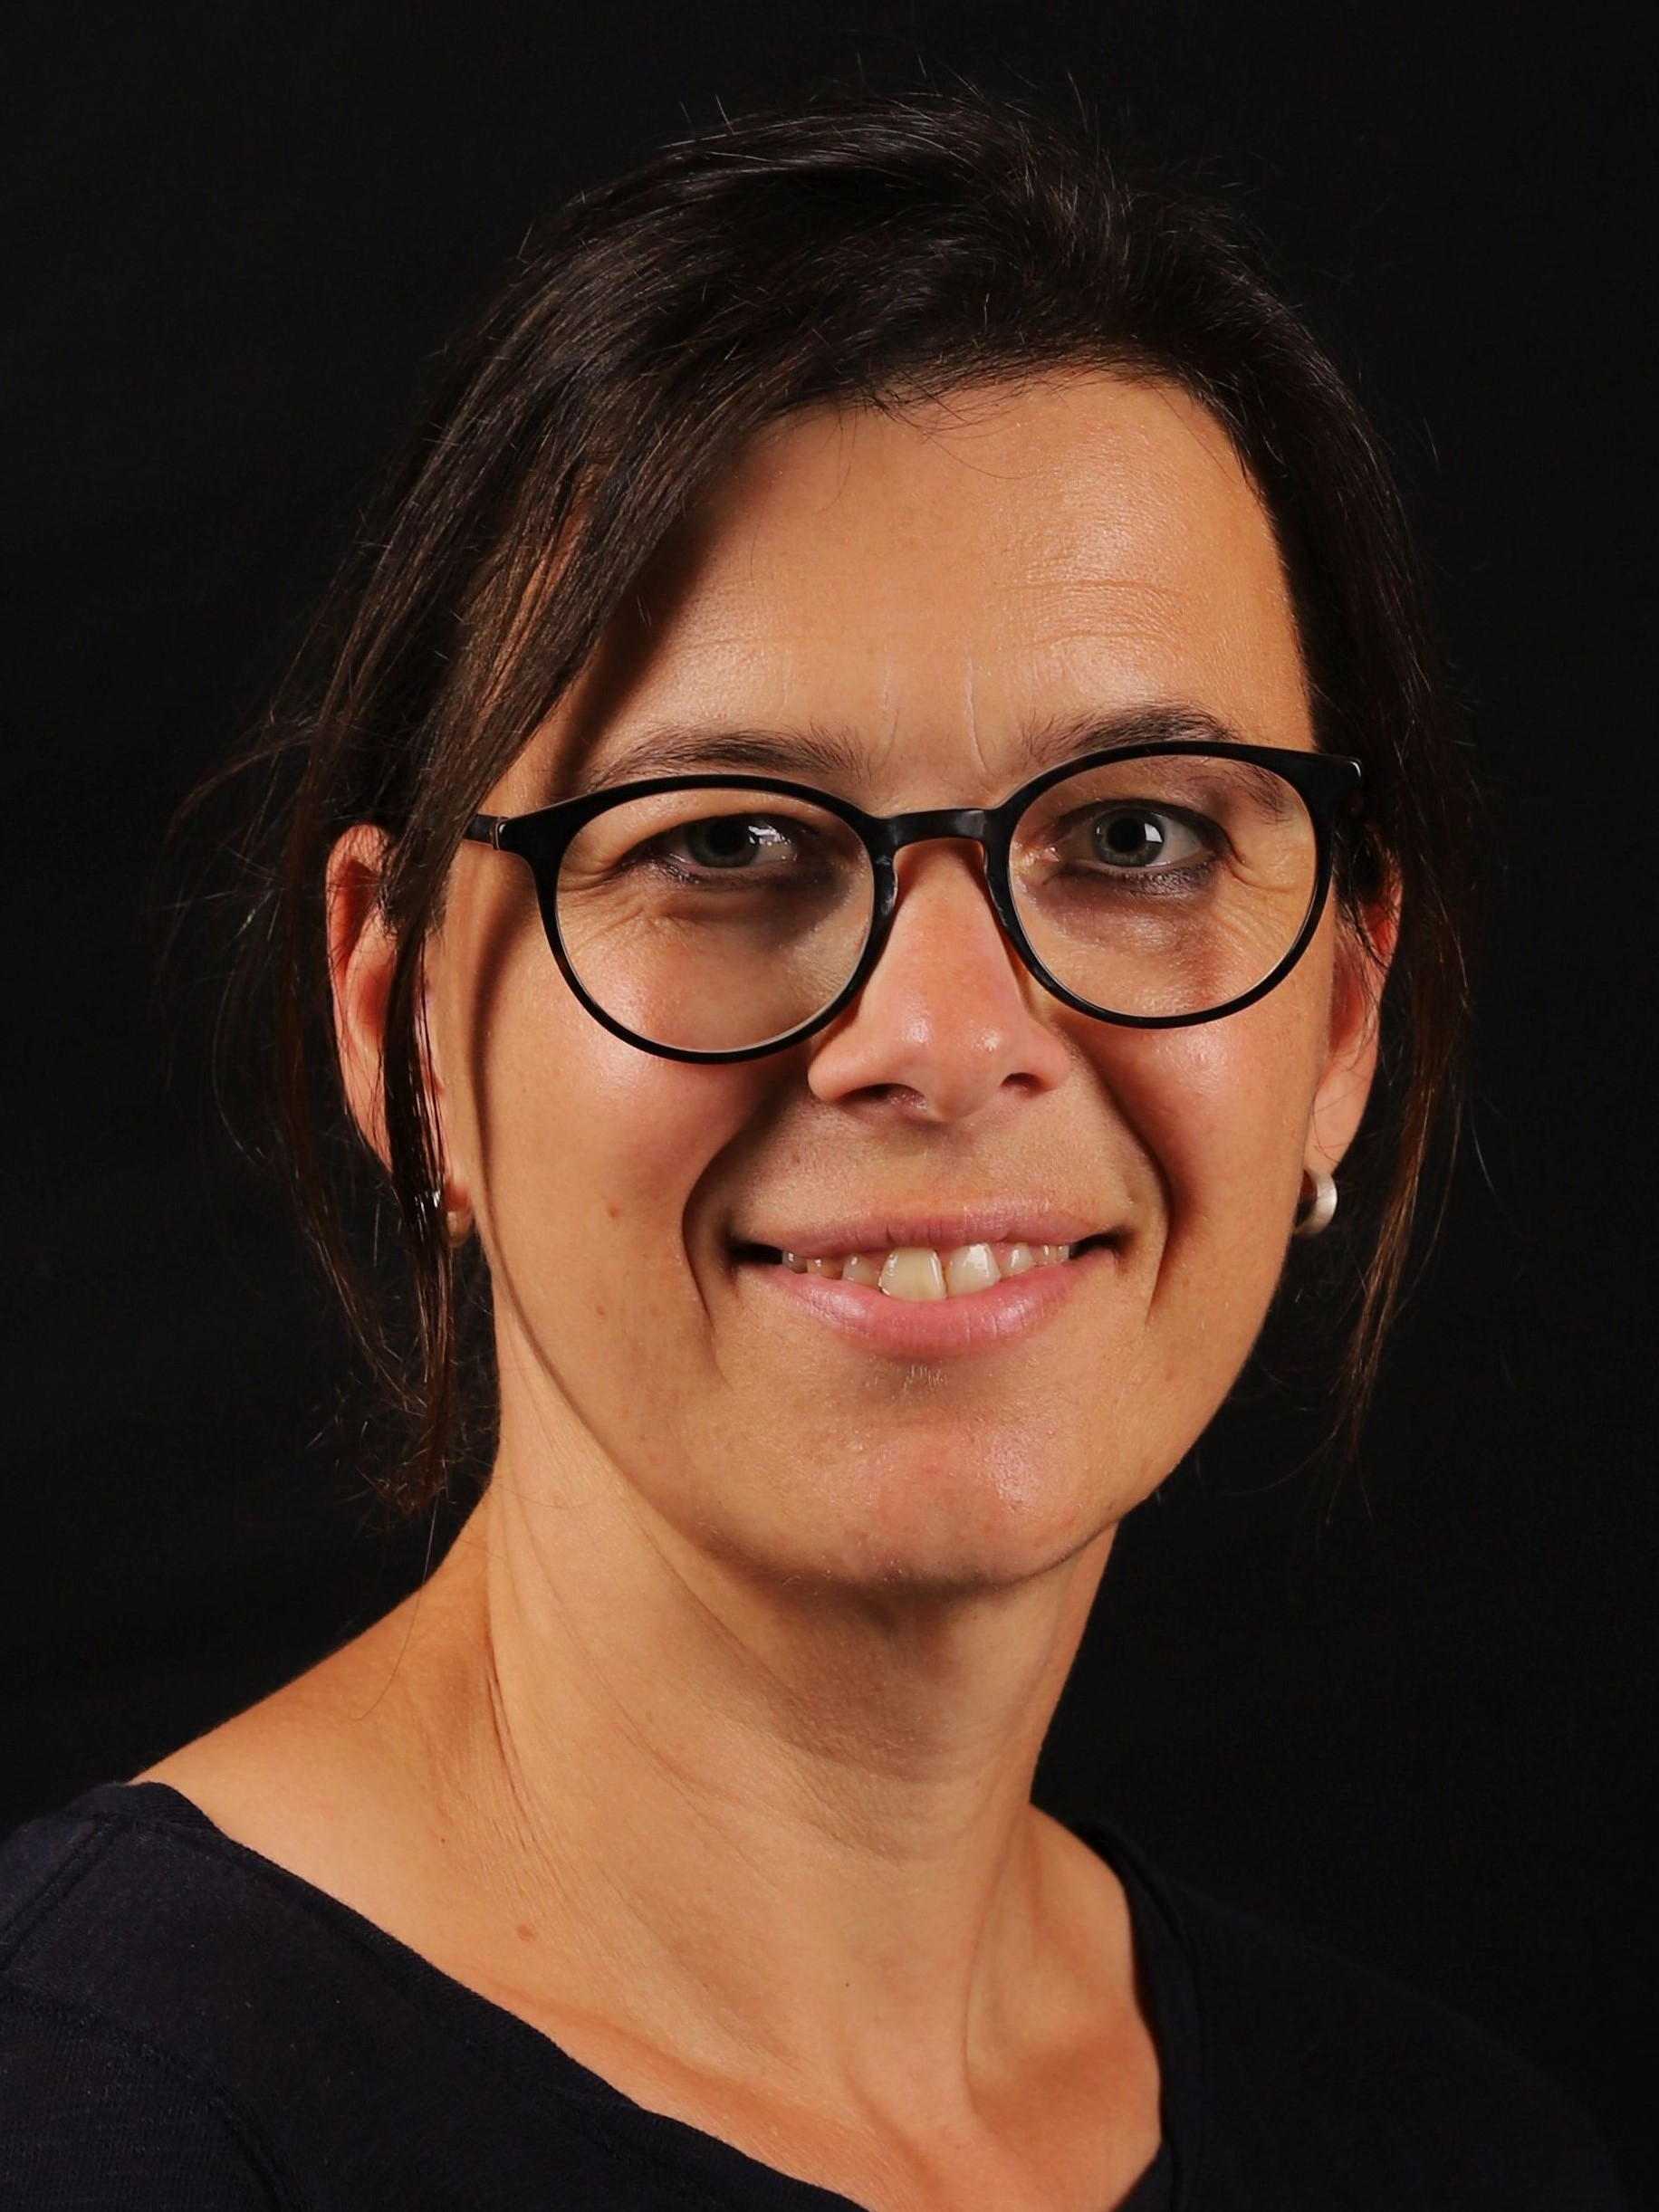 Foto: Portraitaufnahme von Frau Dr. Katharina Minst